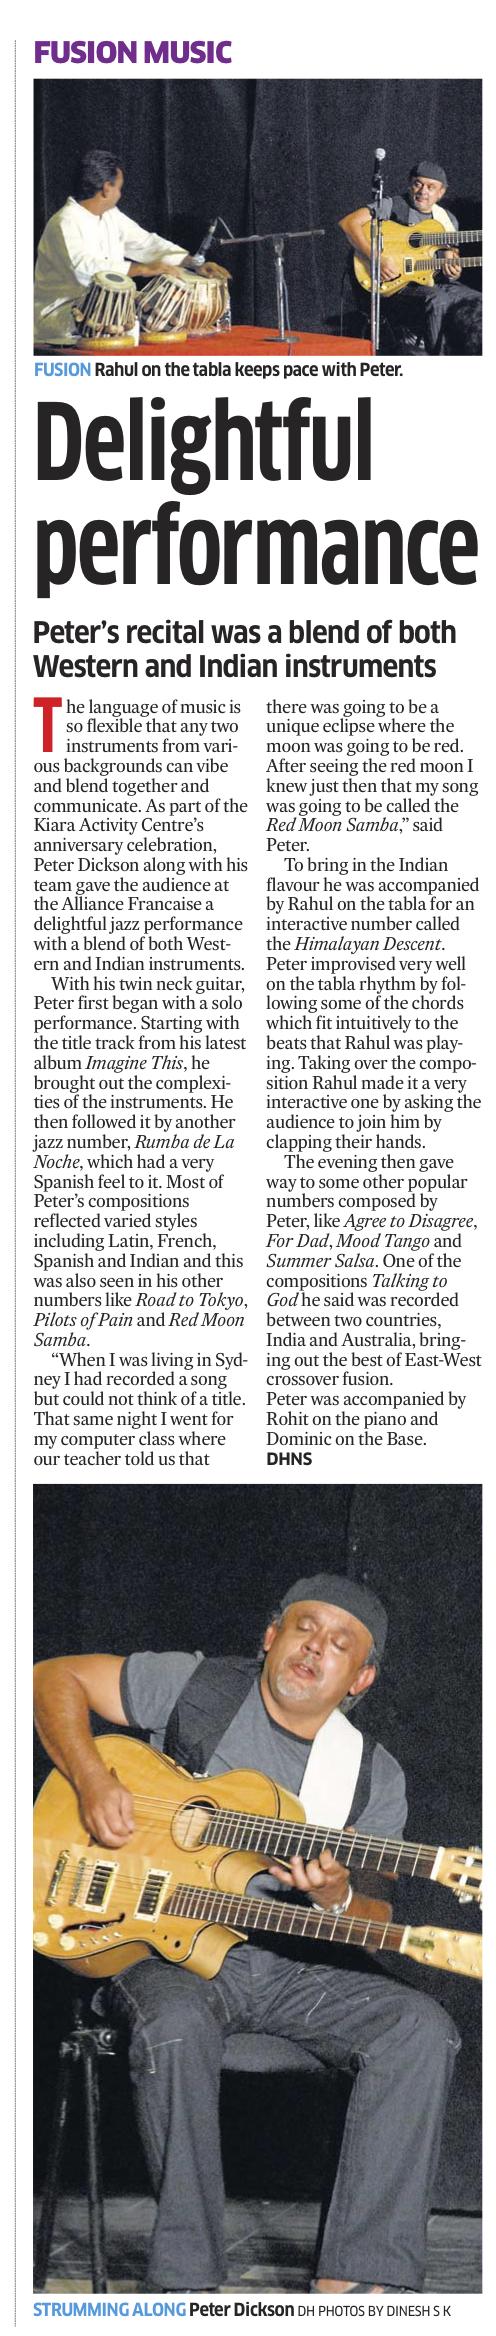 Deccan Herald - Metro Life